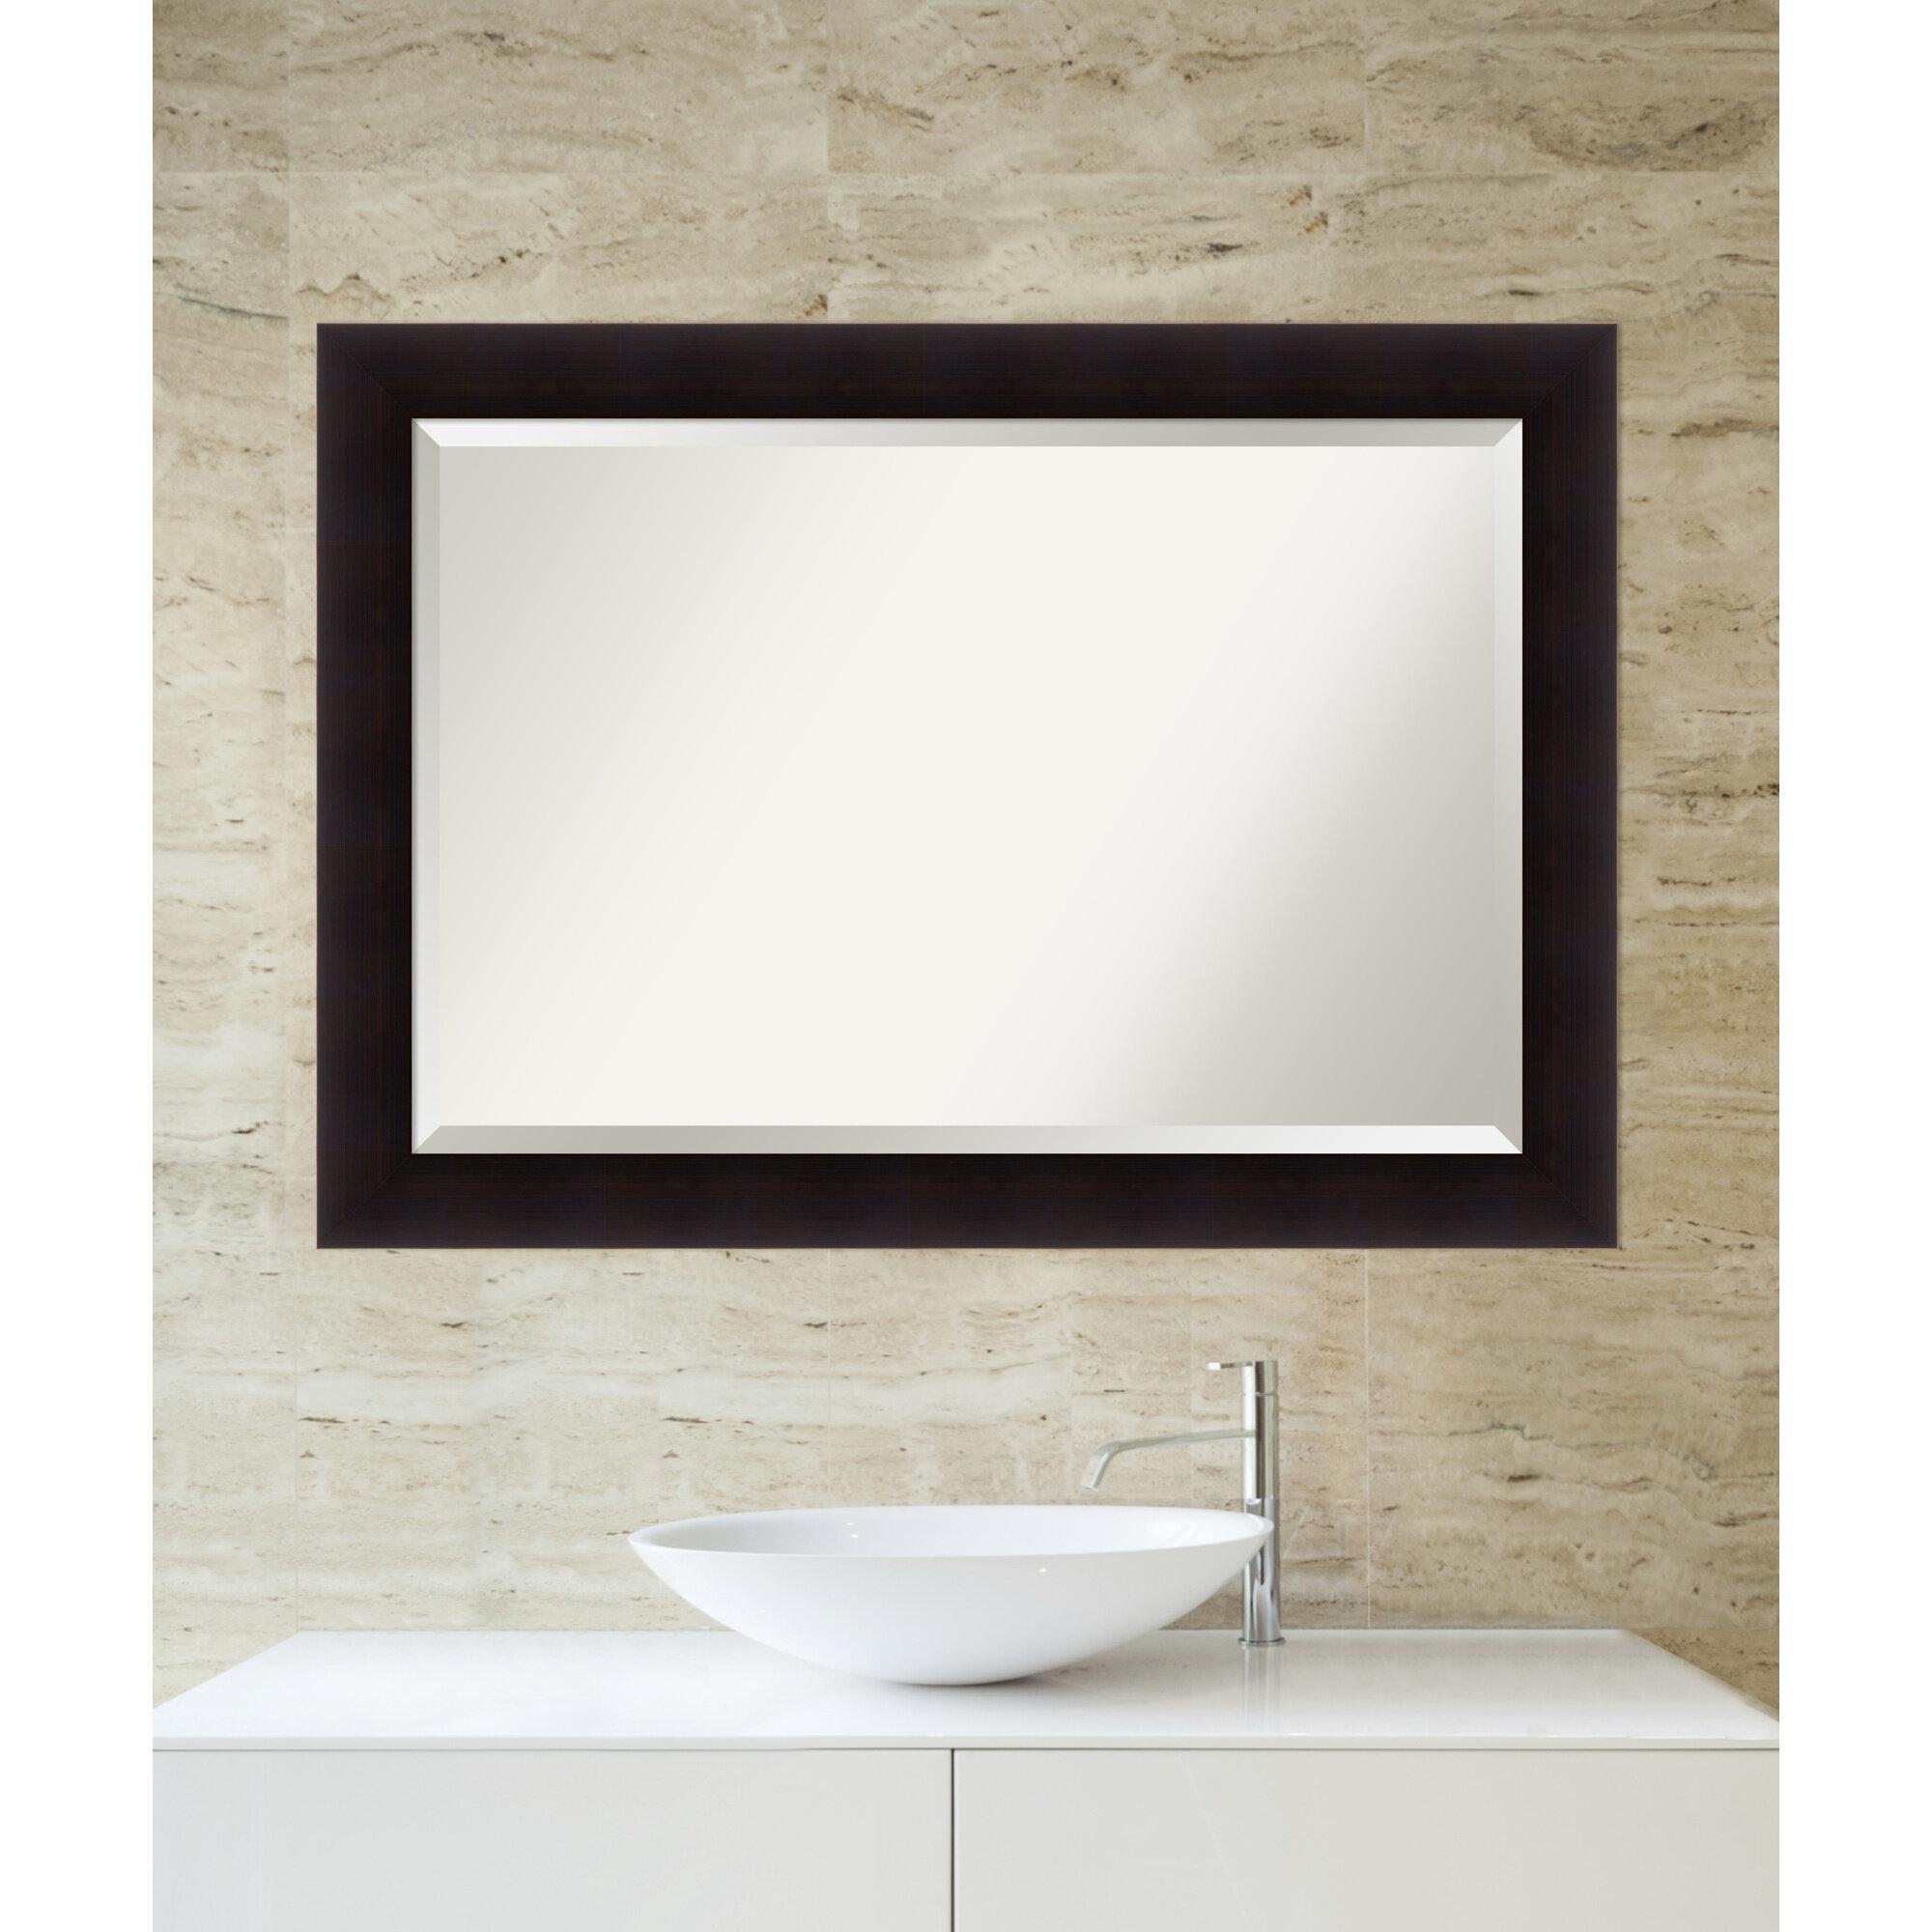 Red Barrel Studio Rectangle Espresso Frame Bathroom Mirror | Wayfair